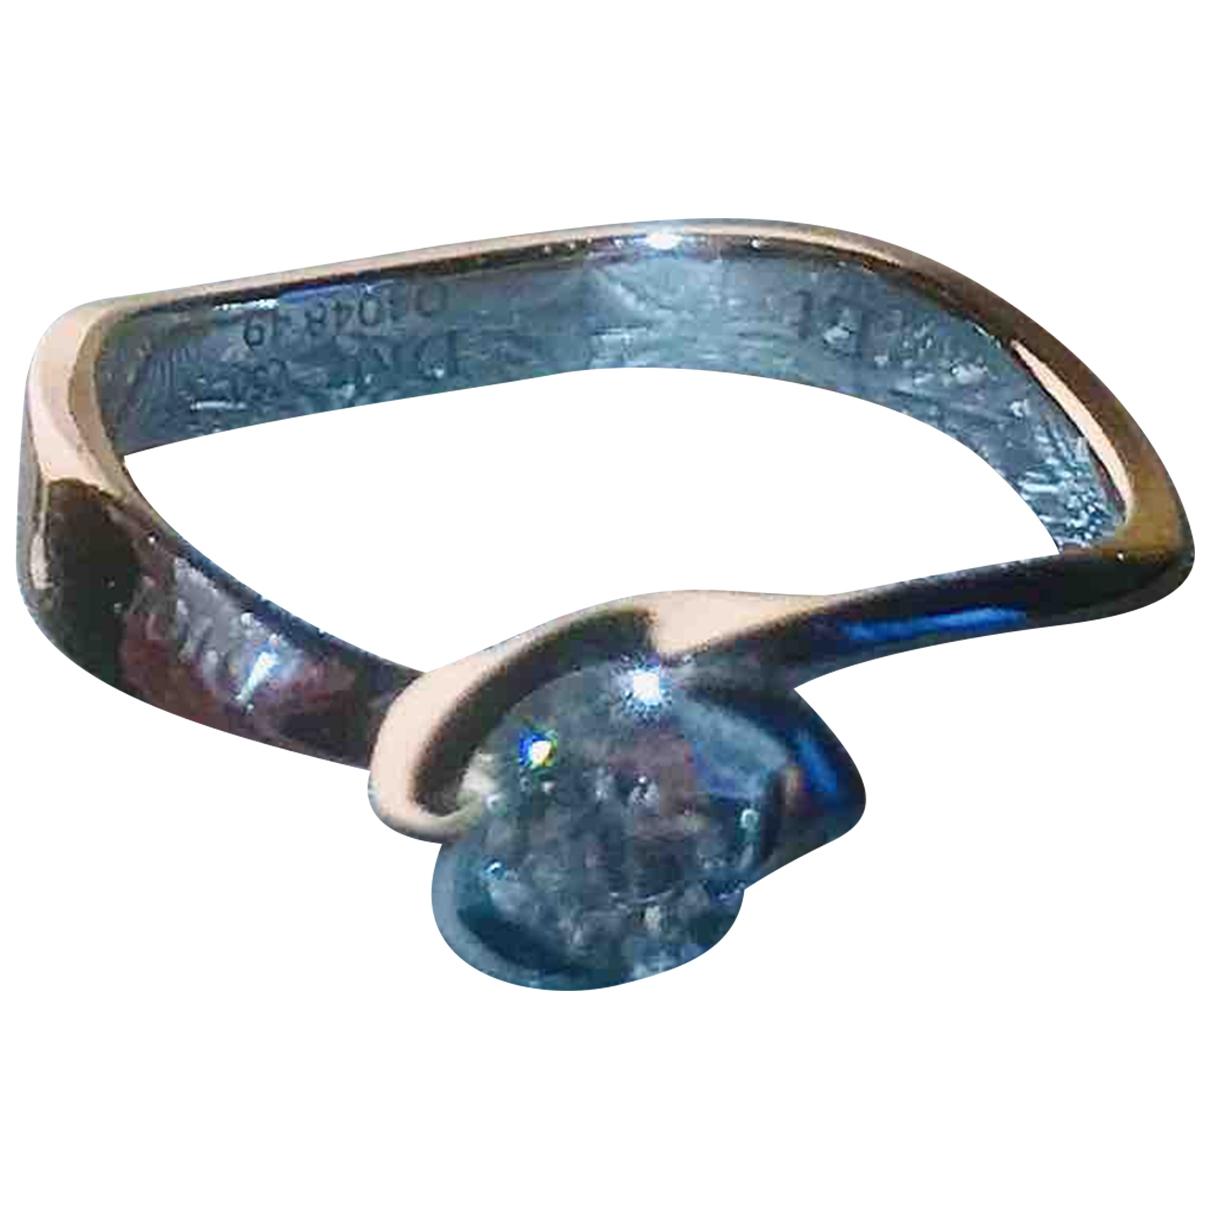 Dior Miss dior Ring in  Weiss Weissgold